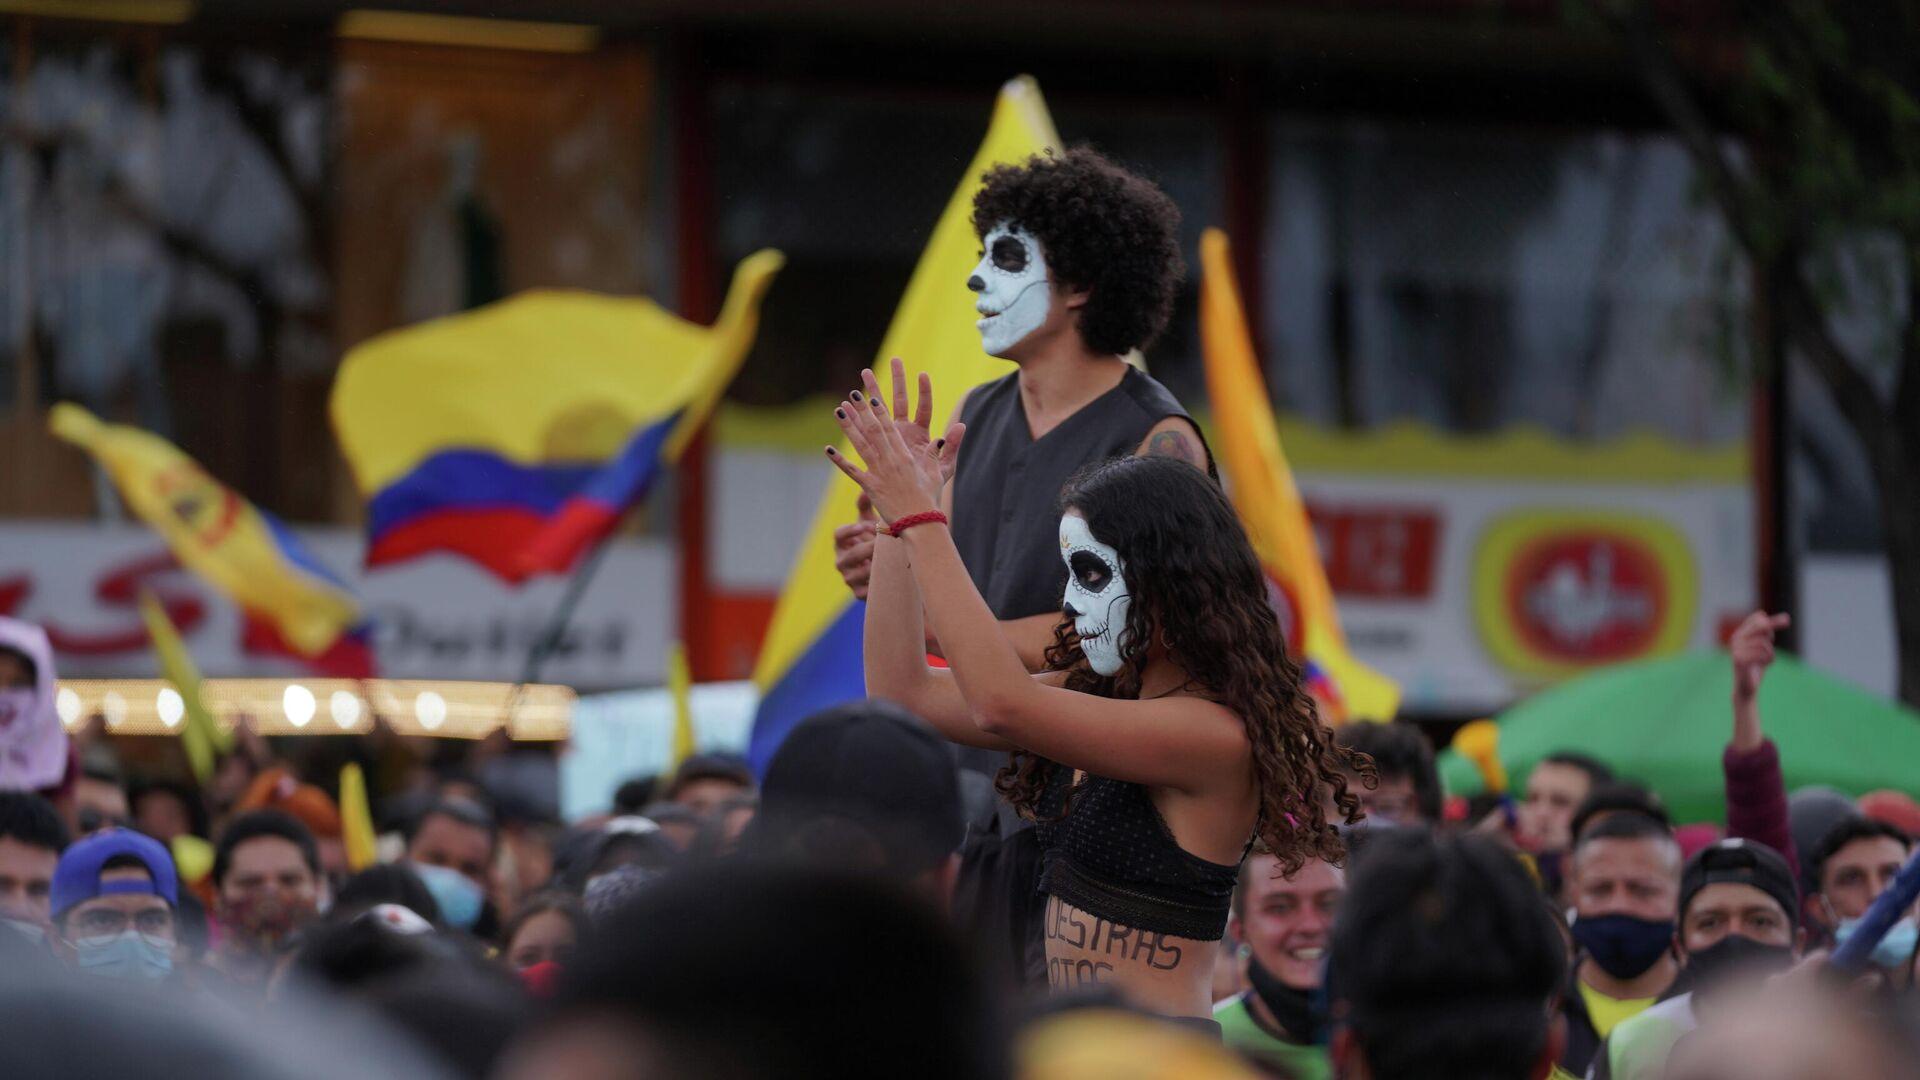 Protestas en Colombia - Sputnik Mundo, 1920, 17.05.2021